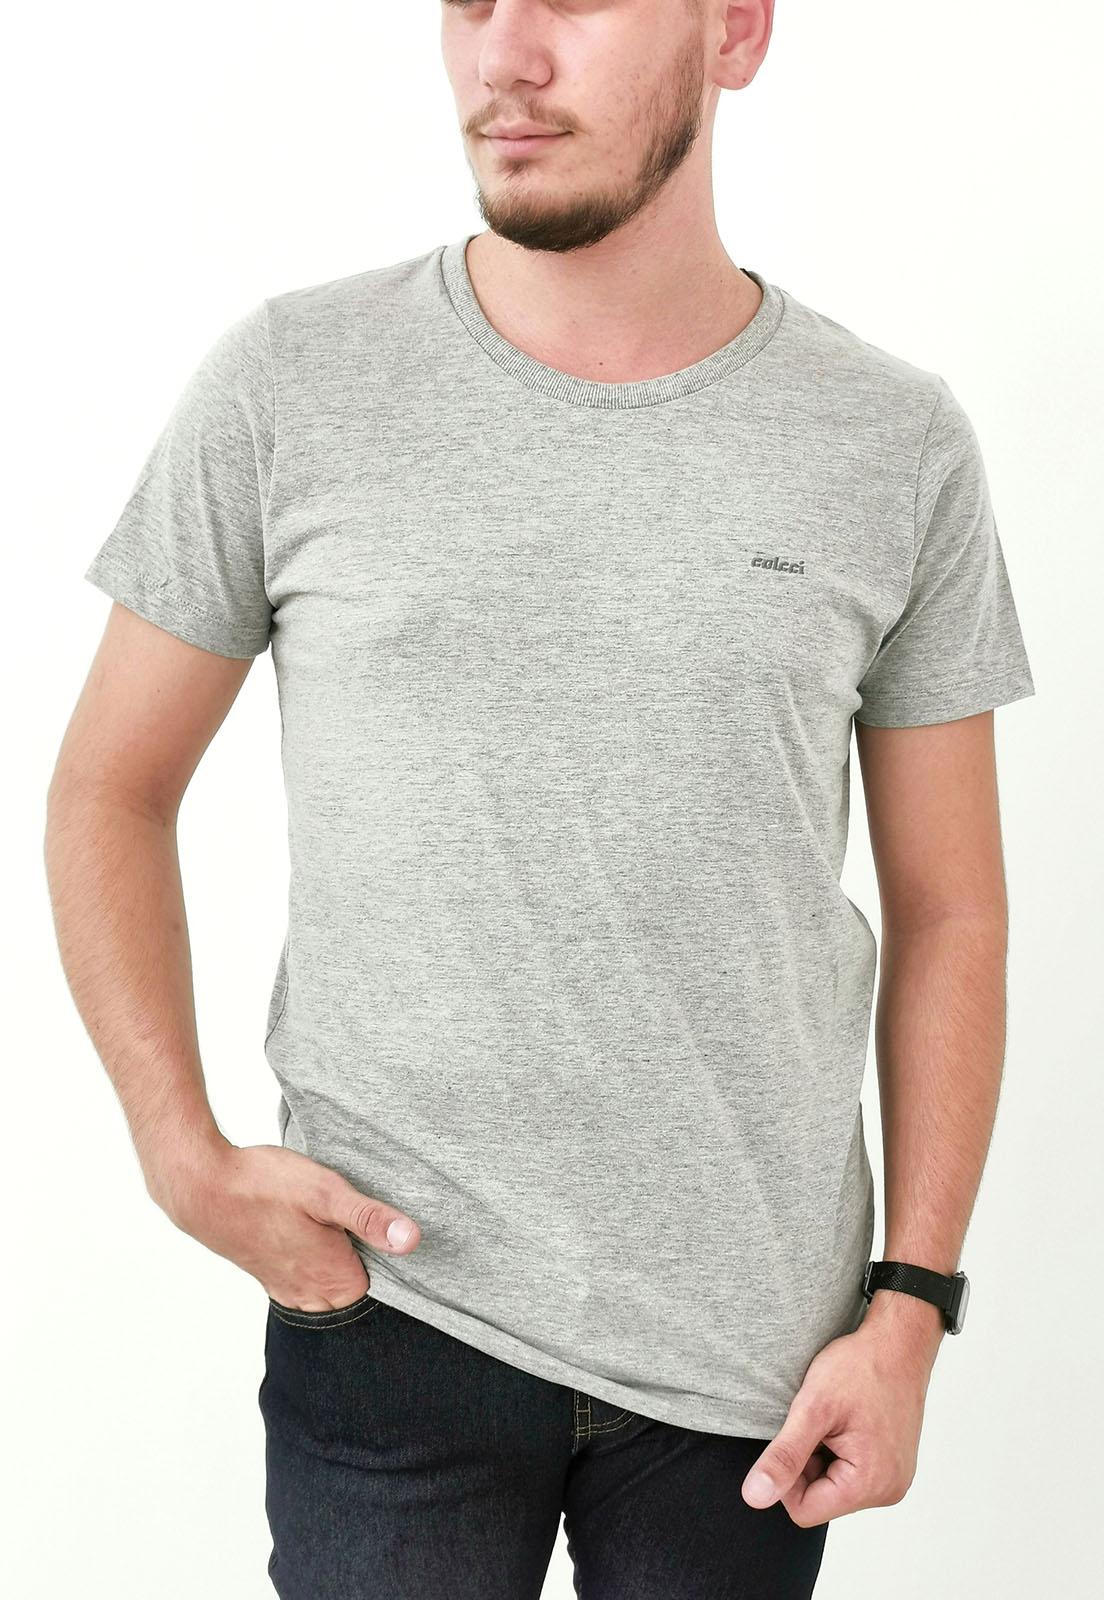 Camiseta Colcci Básica Cinza Mescla com Bordado